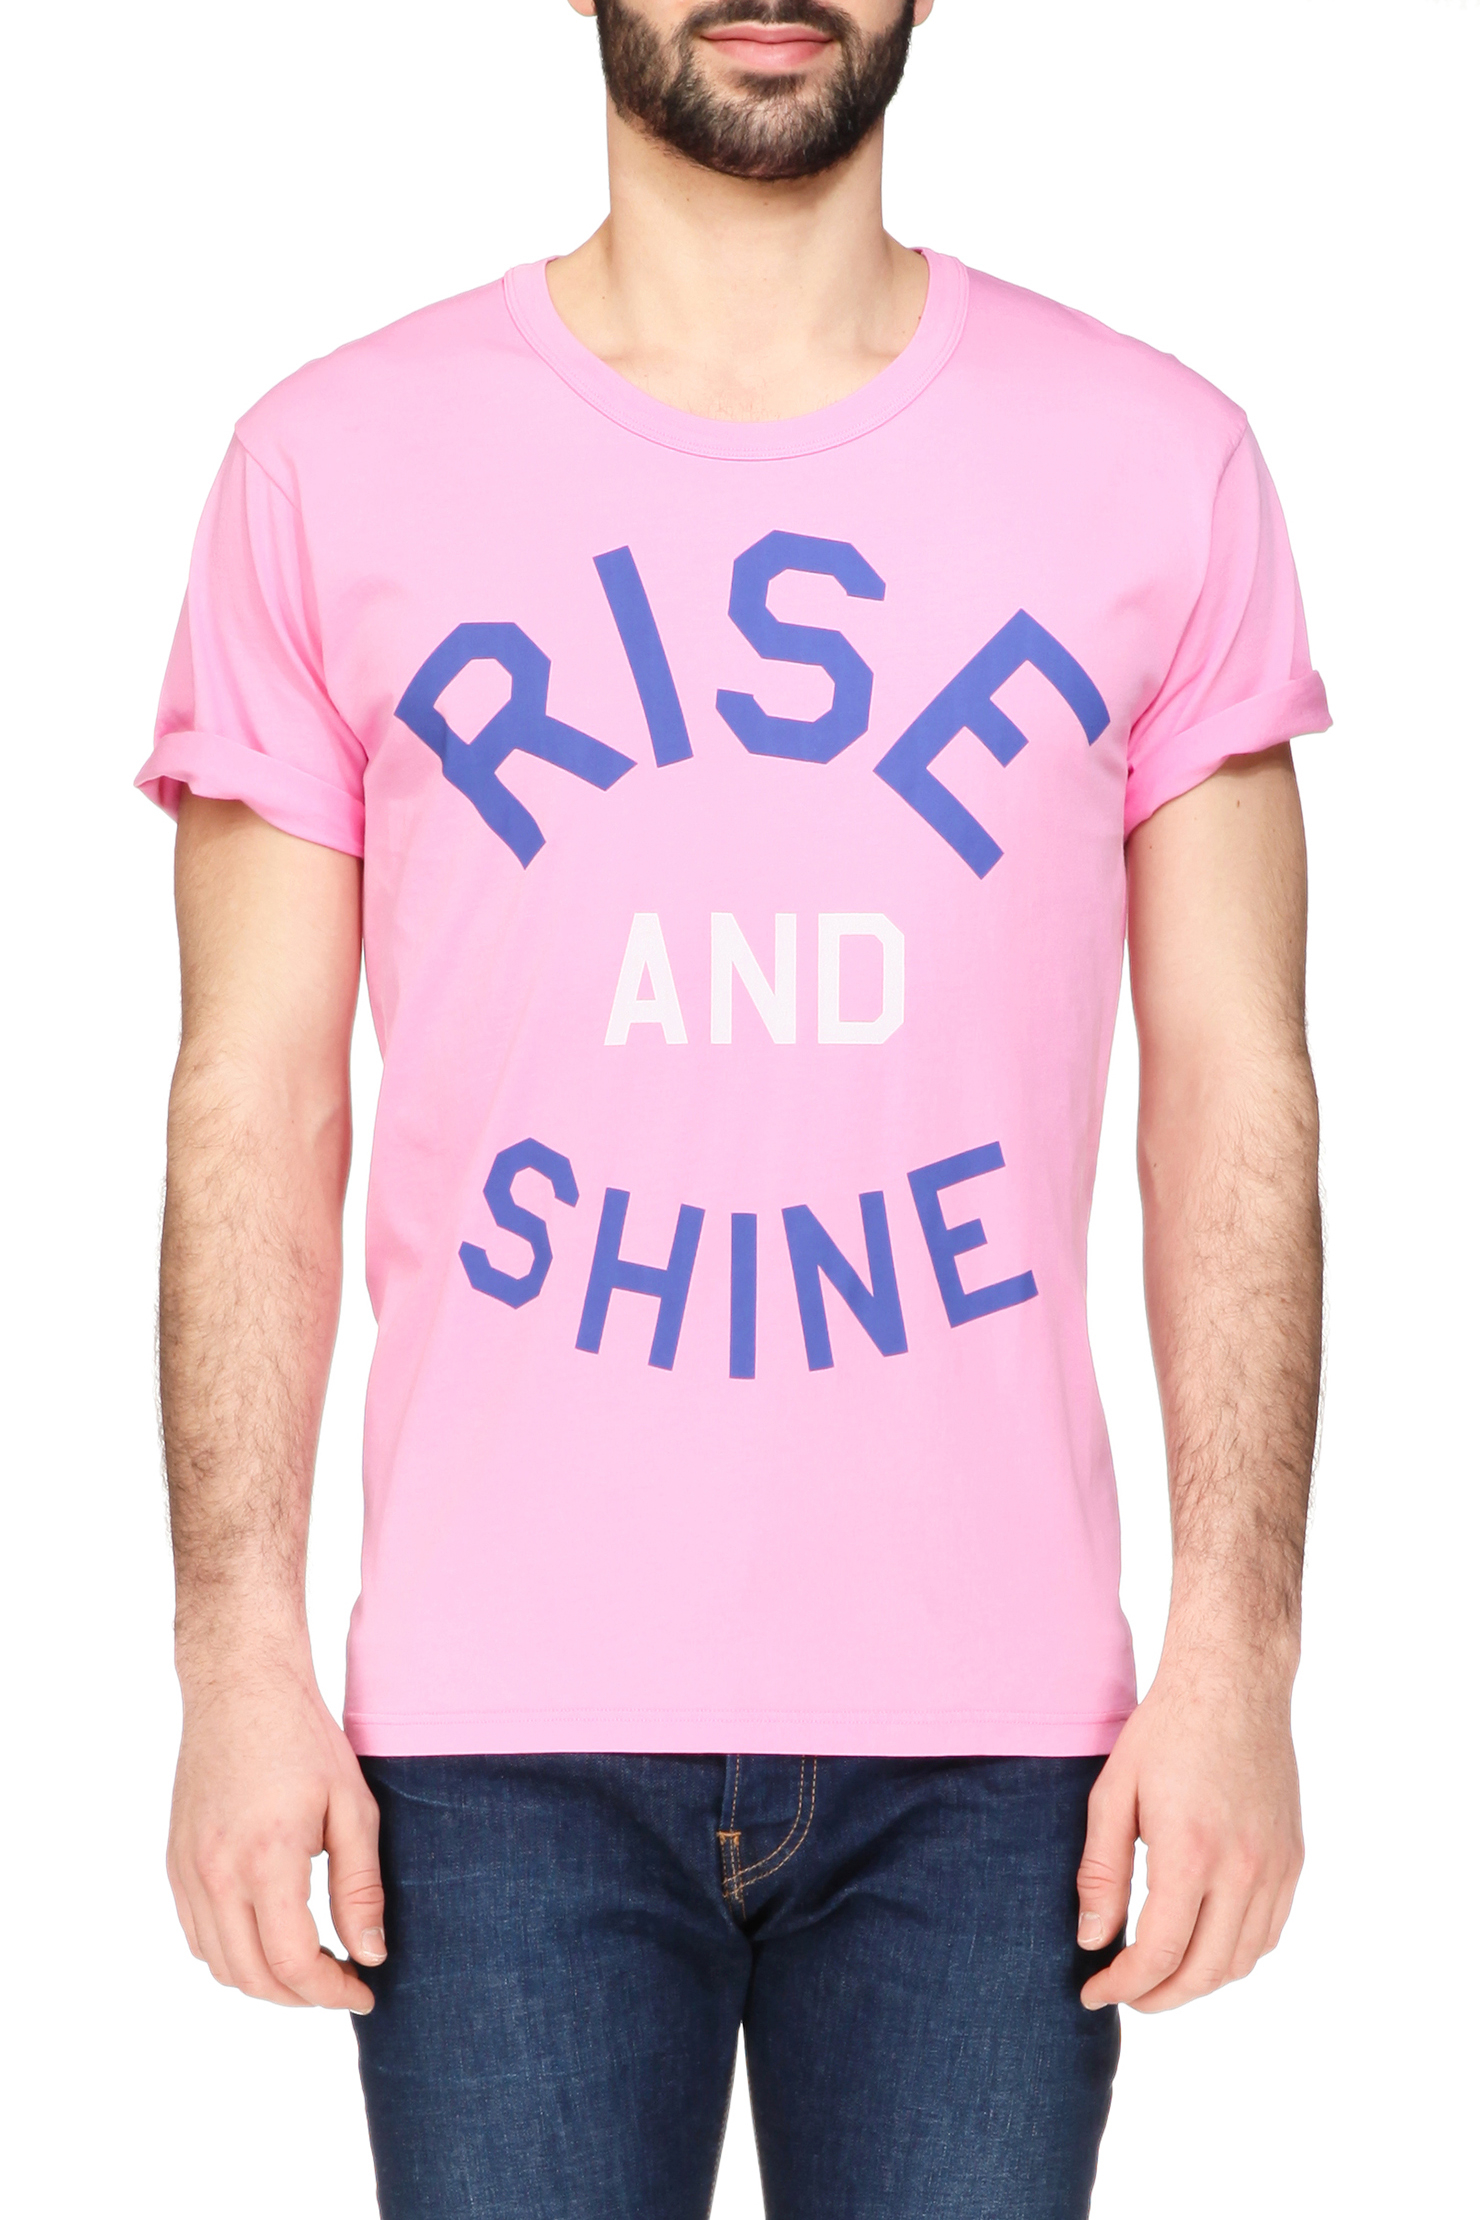 pepe jeans short sleeve t shirt in pink for men lyst. Black Bedroom Furniture Sets. Home Design Ideas